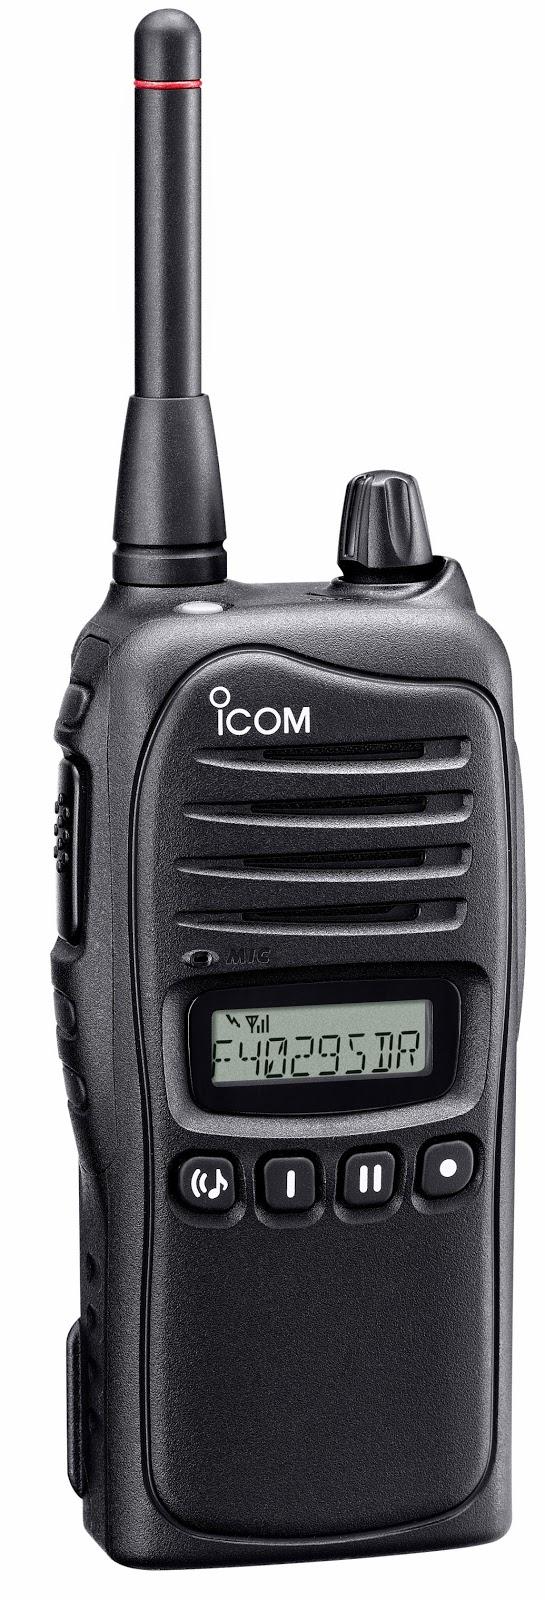 Icom IC-F4029SDR dPMR446 radio